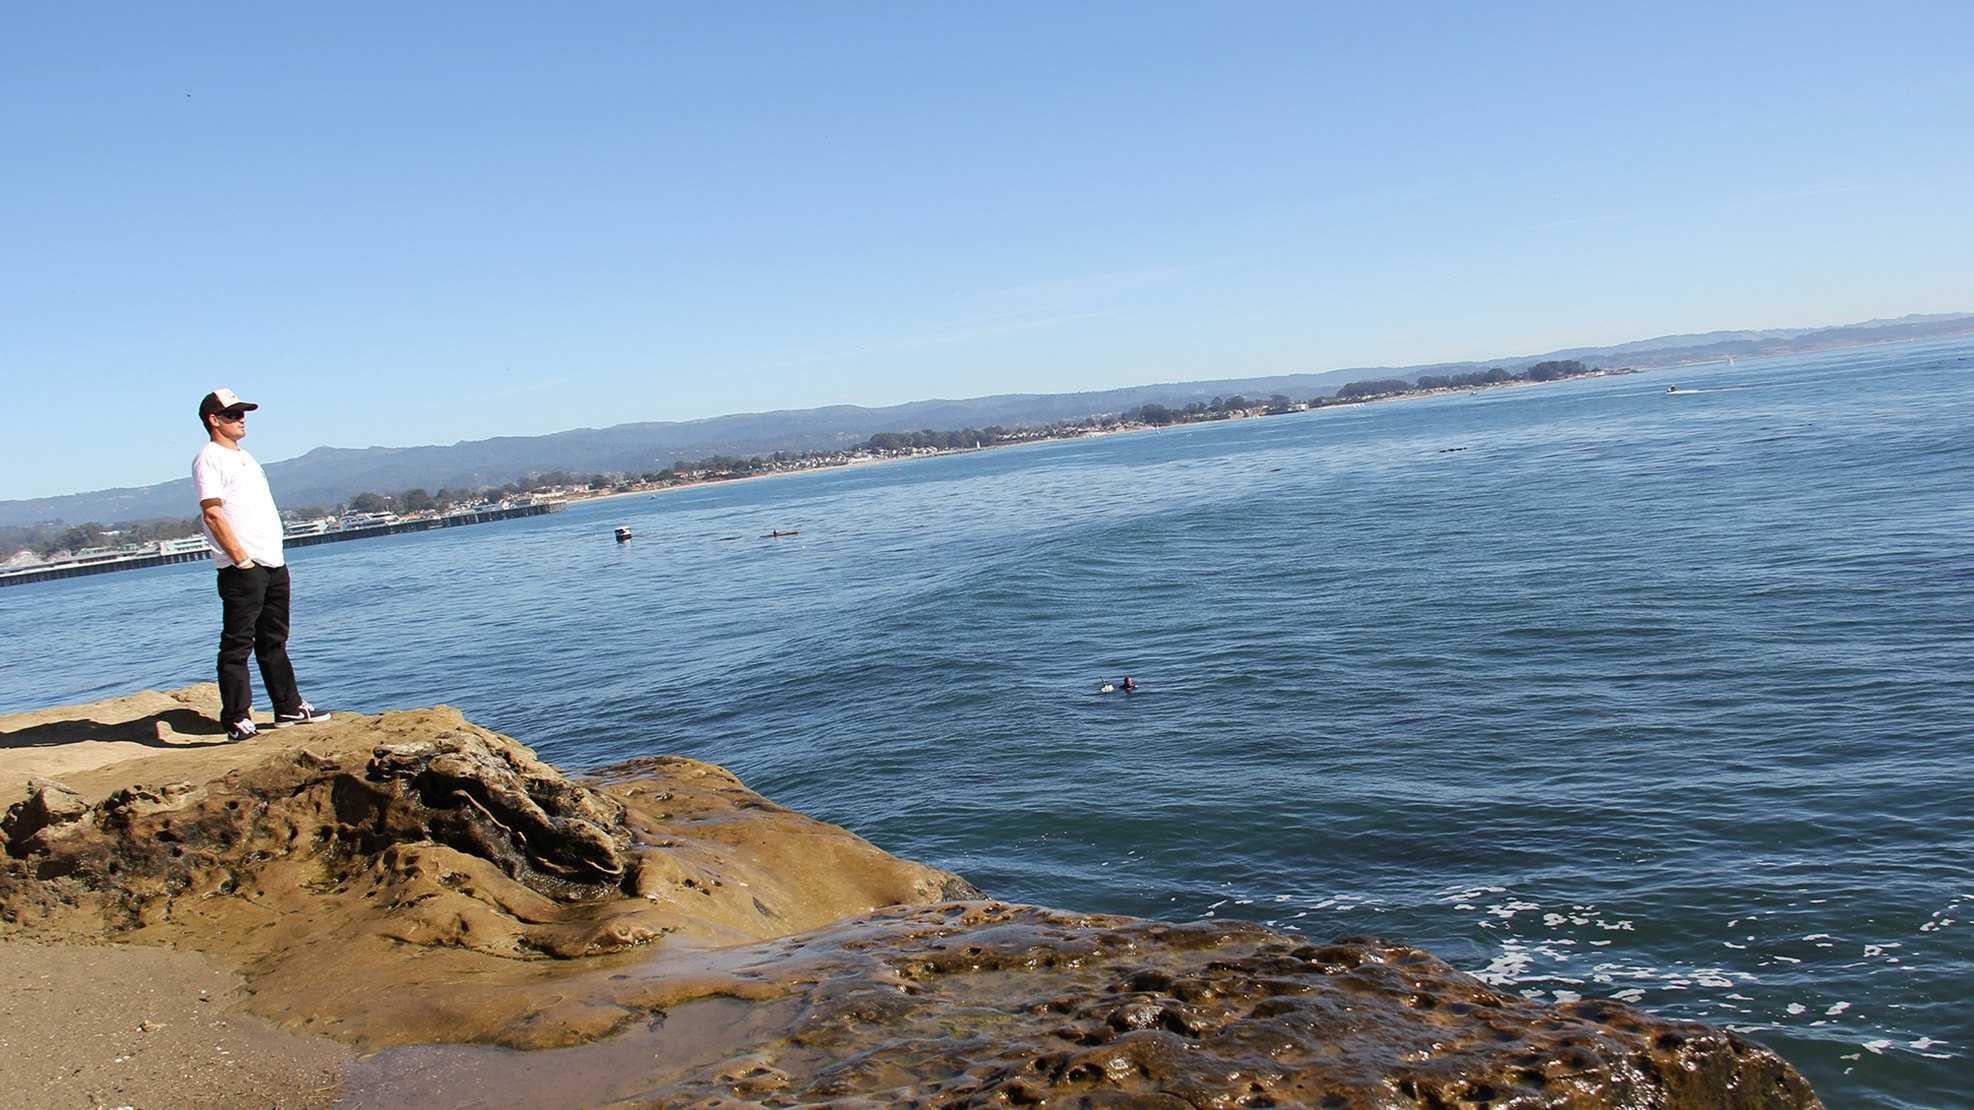 A Santa Cruz surfer watches the waves at Steamer Lane.